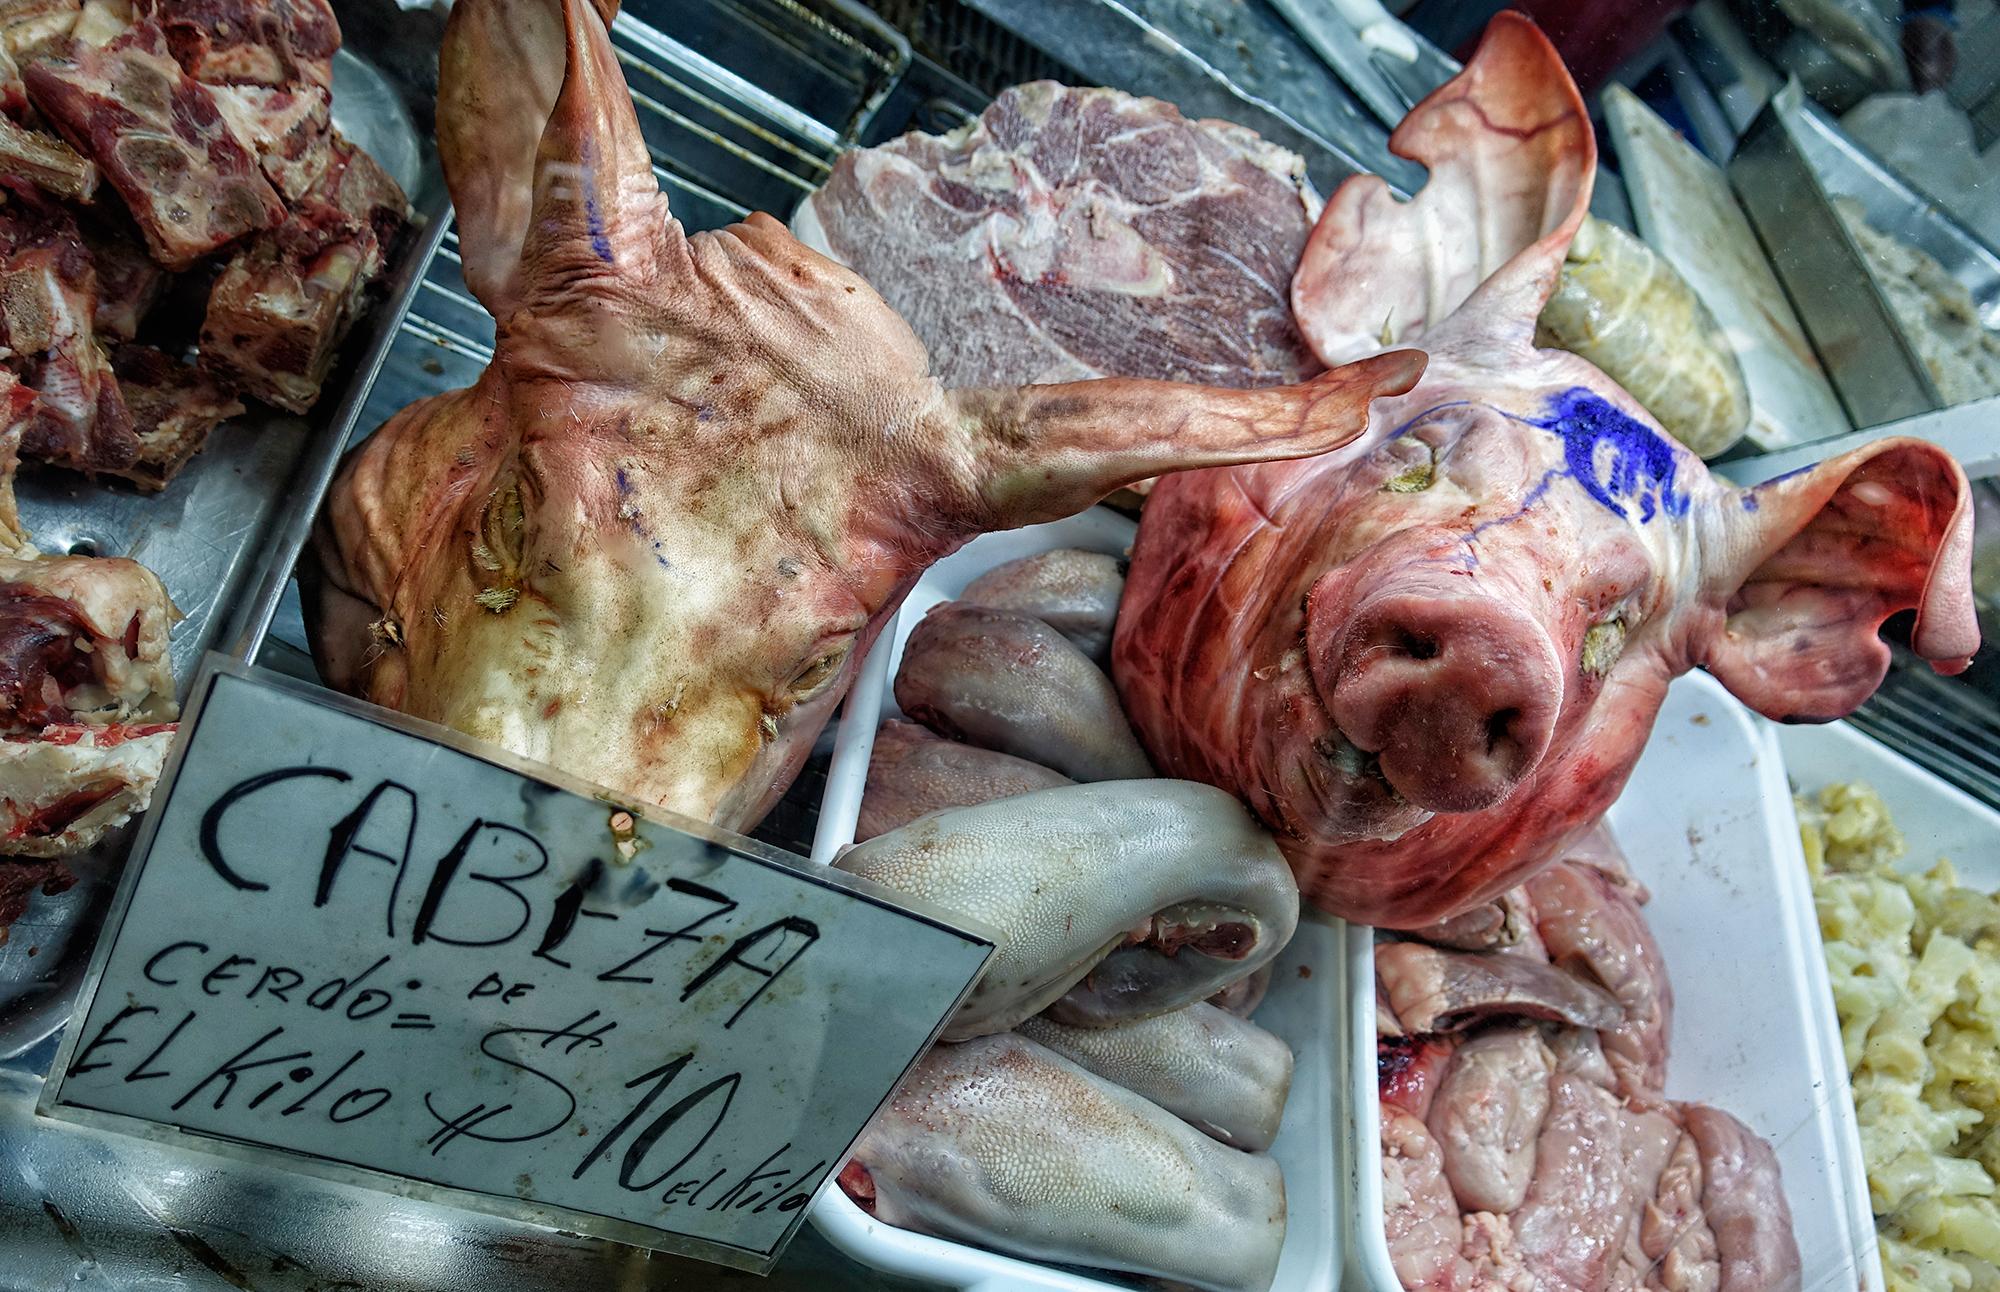 Pig's Heads for Soup! Mercado Central, Mendoza, Argentine, 2016